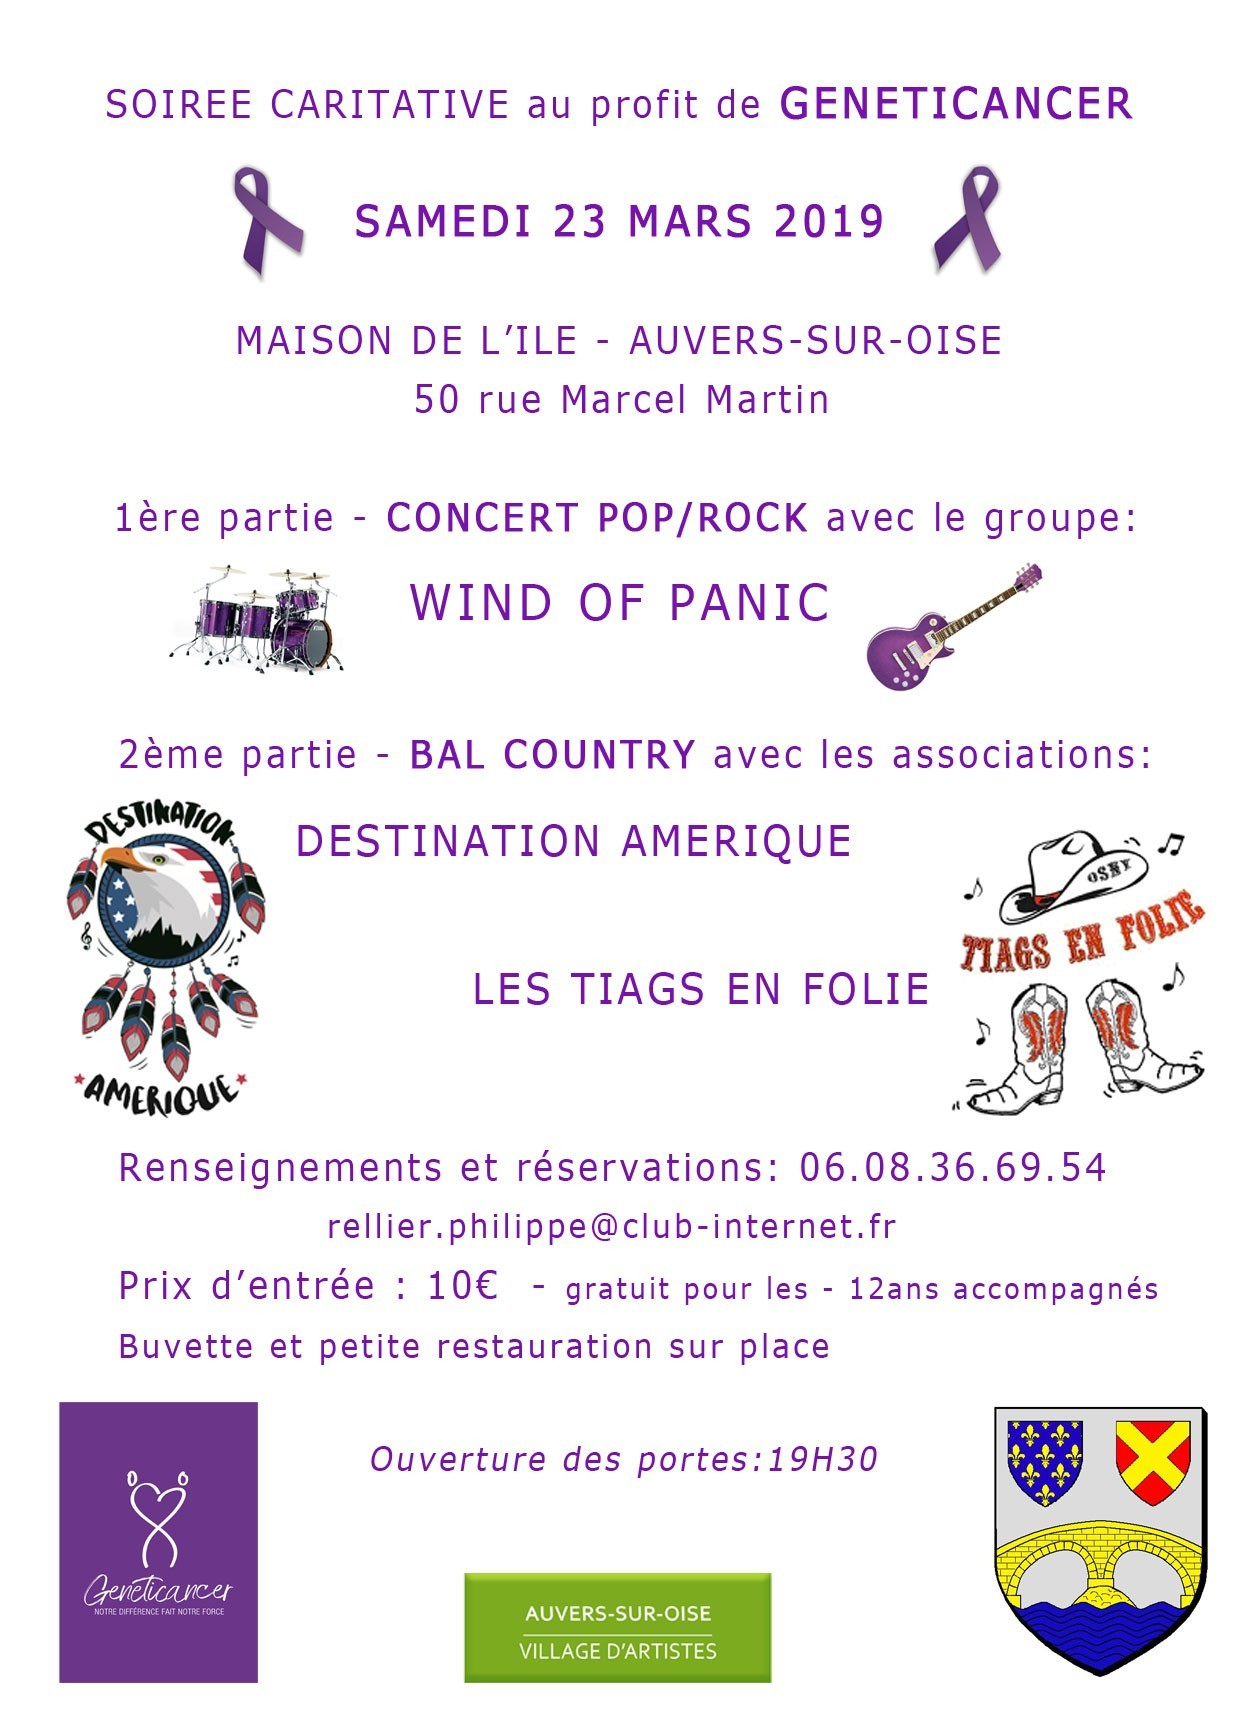 Soirée caritative: Concert POP /ROCK + bal country